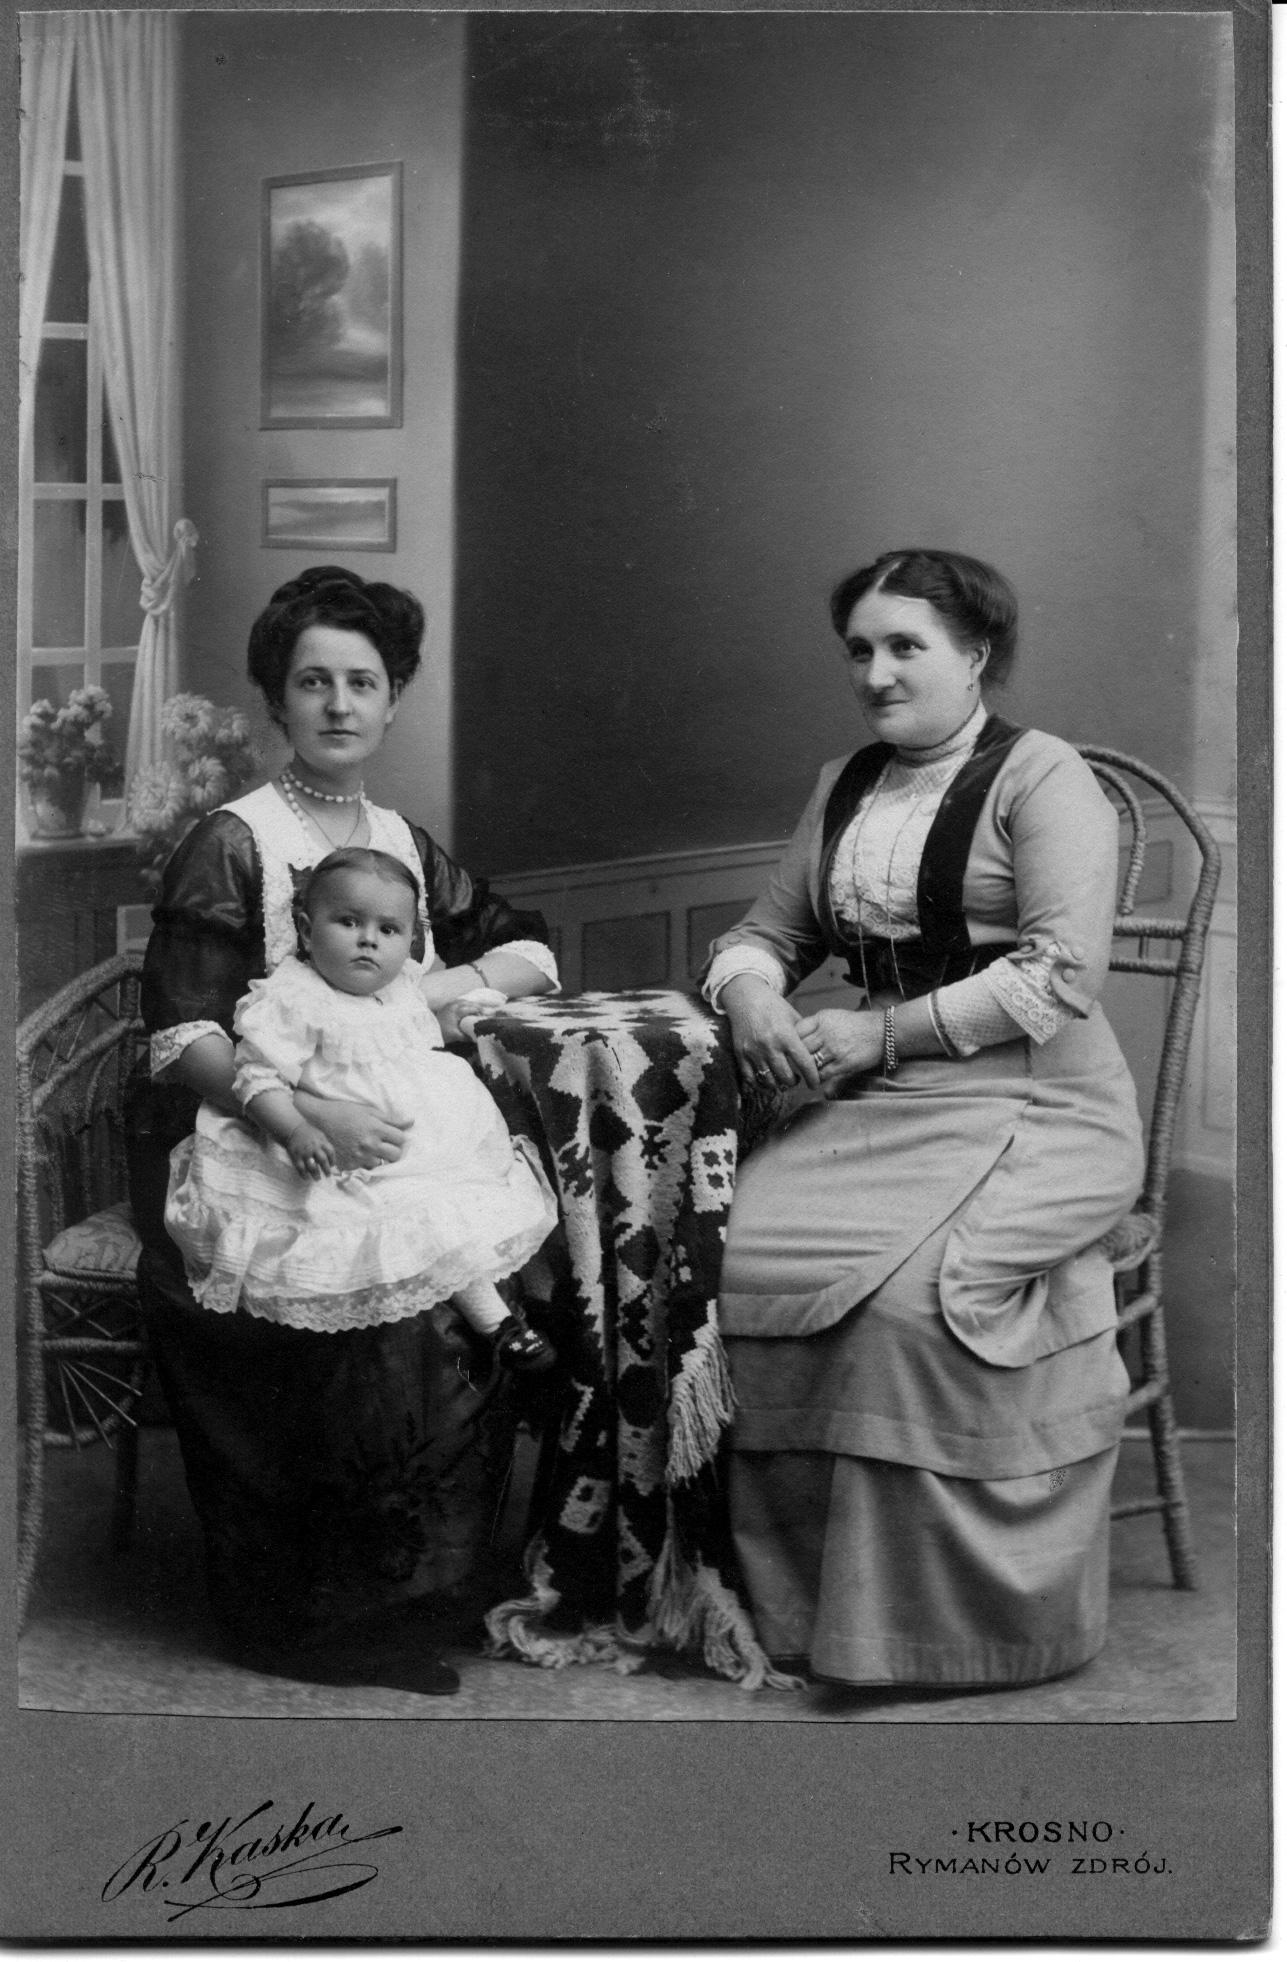 Winifred, Olive Perkins & Jessie Nicklos in 1912